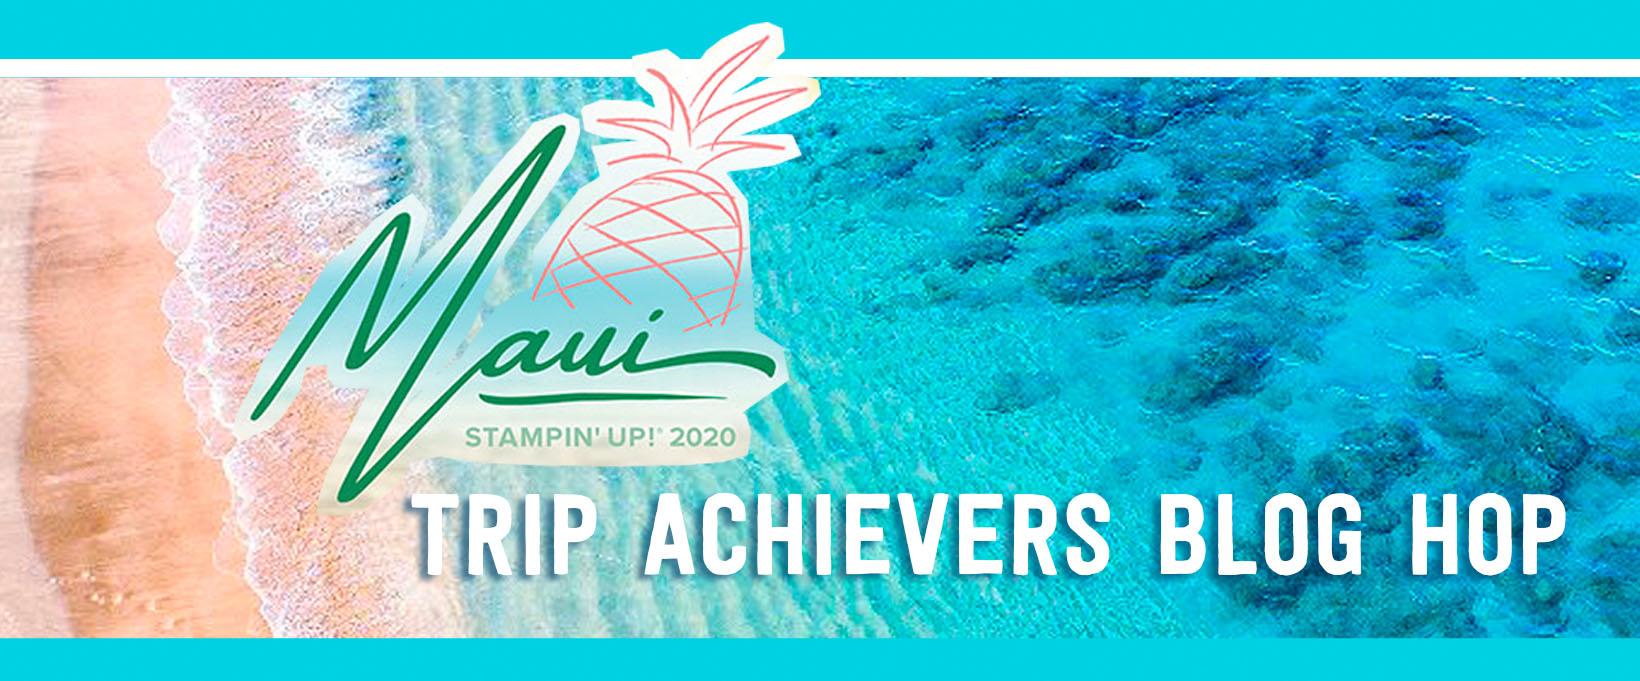 Pip Todman Stampin' Up! Demonstrator UK Maui Incentive Trip Achievers Blog Hop